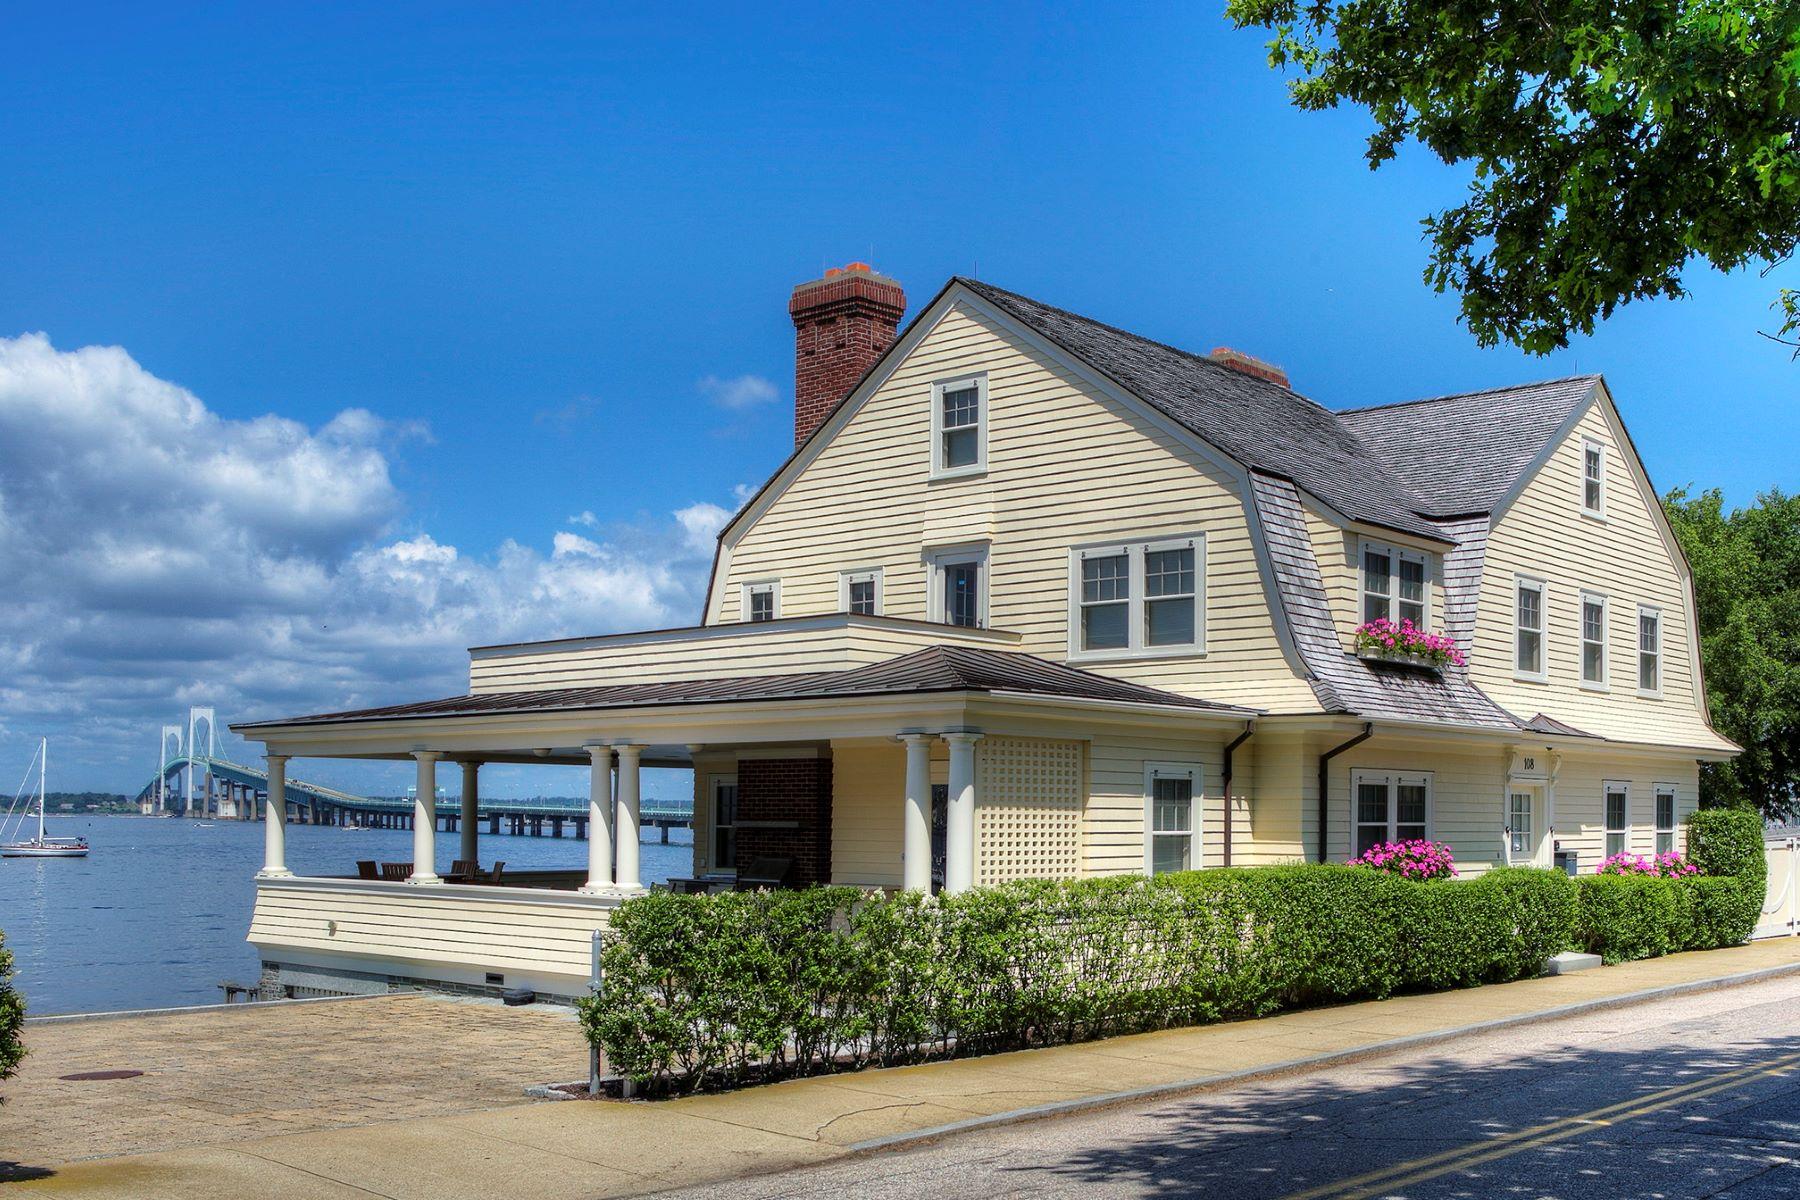 Single Family Homes για την Πώληση στο Waterfront on The Point 108 Washington Street, Newport, Ροουντ Αϊλαντ 02840 Ηνωμένες Πολιτείες